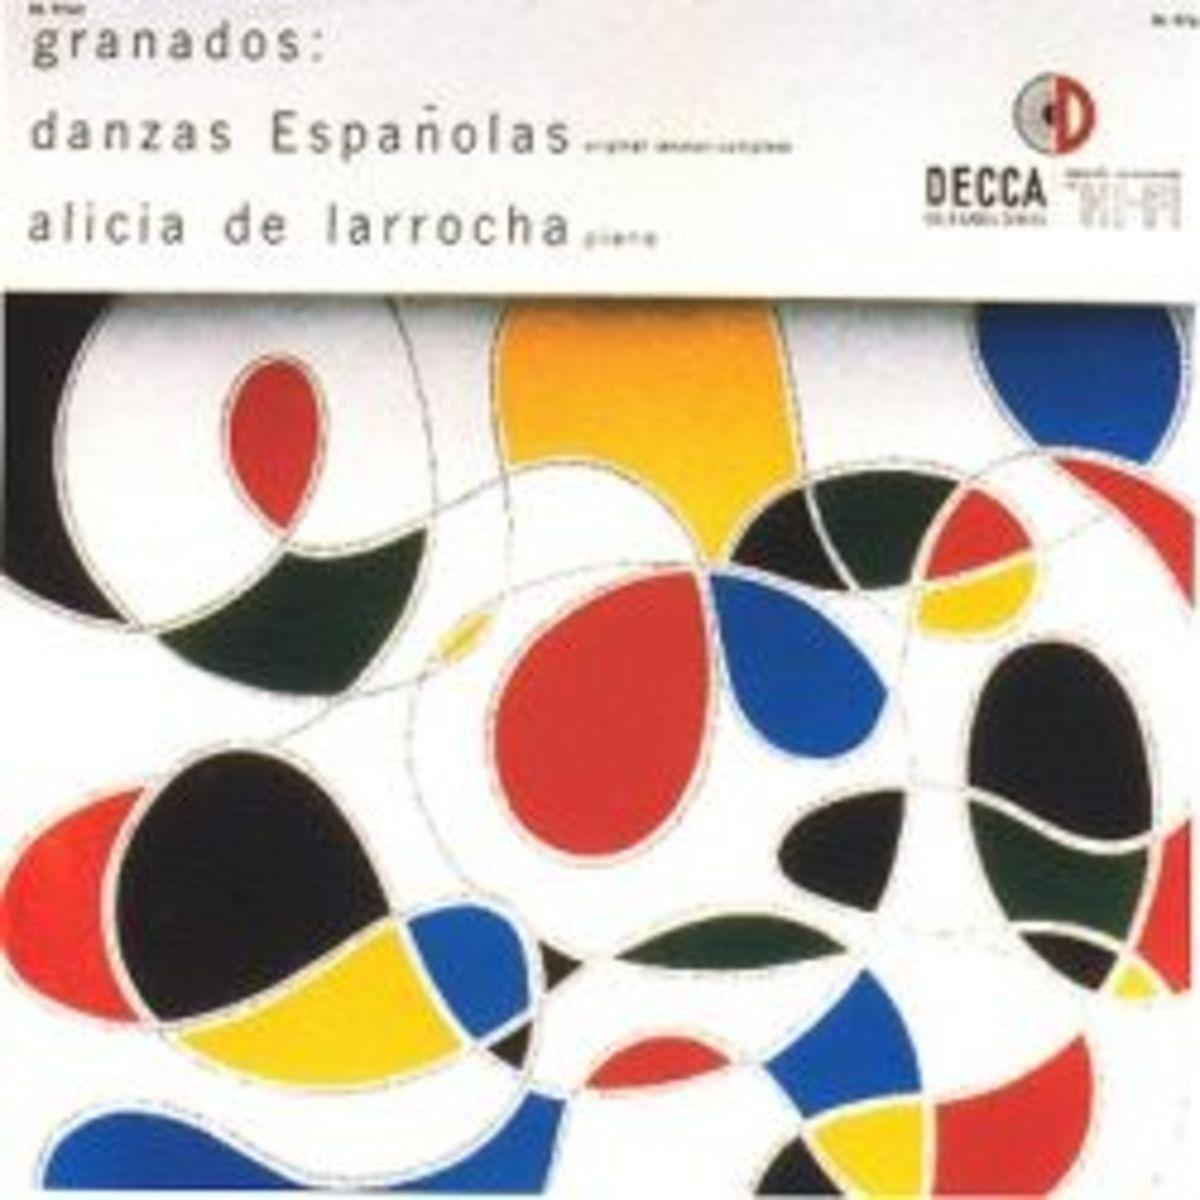 Alicia de Larrocha Granados: Danzas Espanolas Decca Records w/ Alex Steinweiss Cover Art